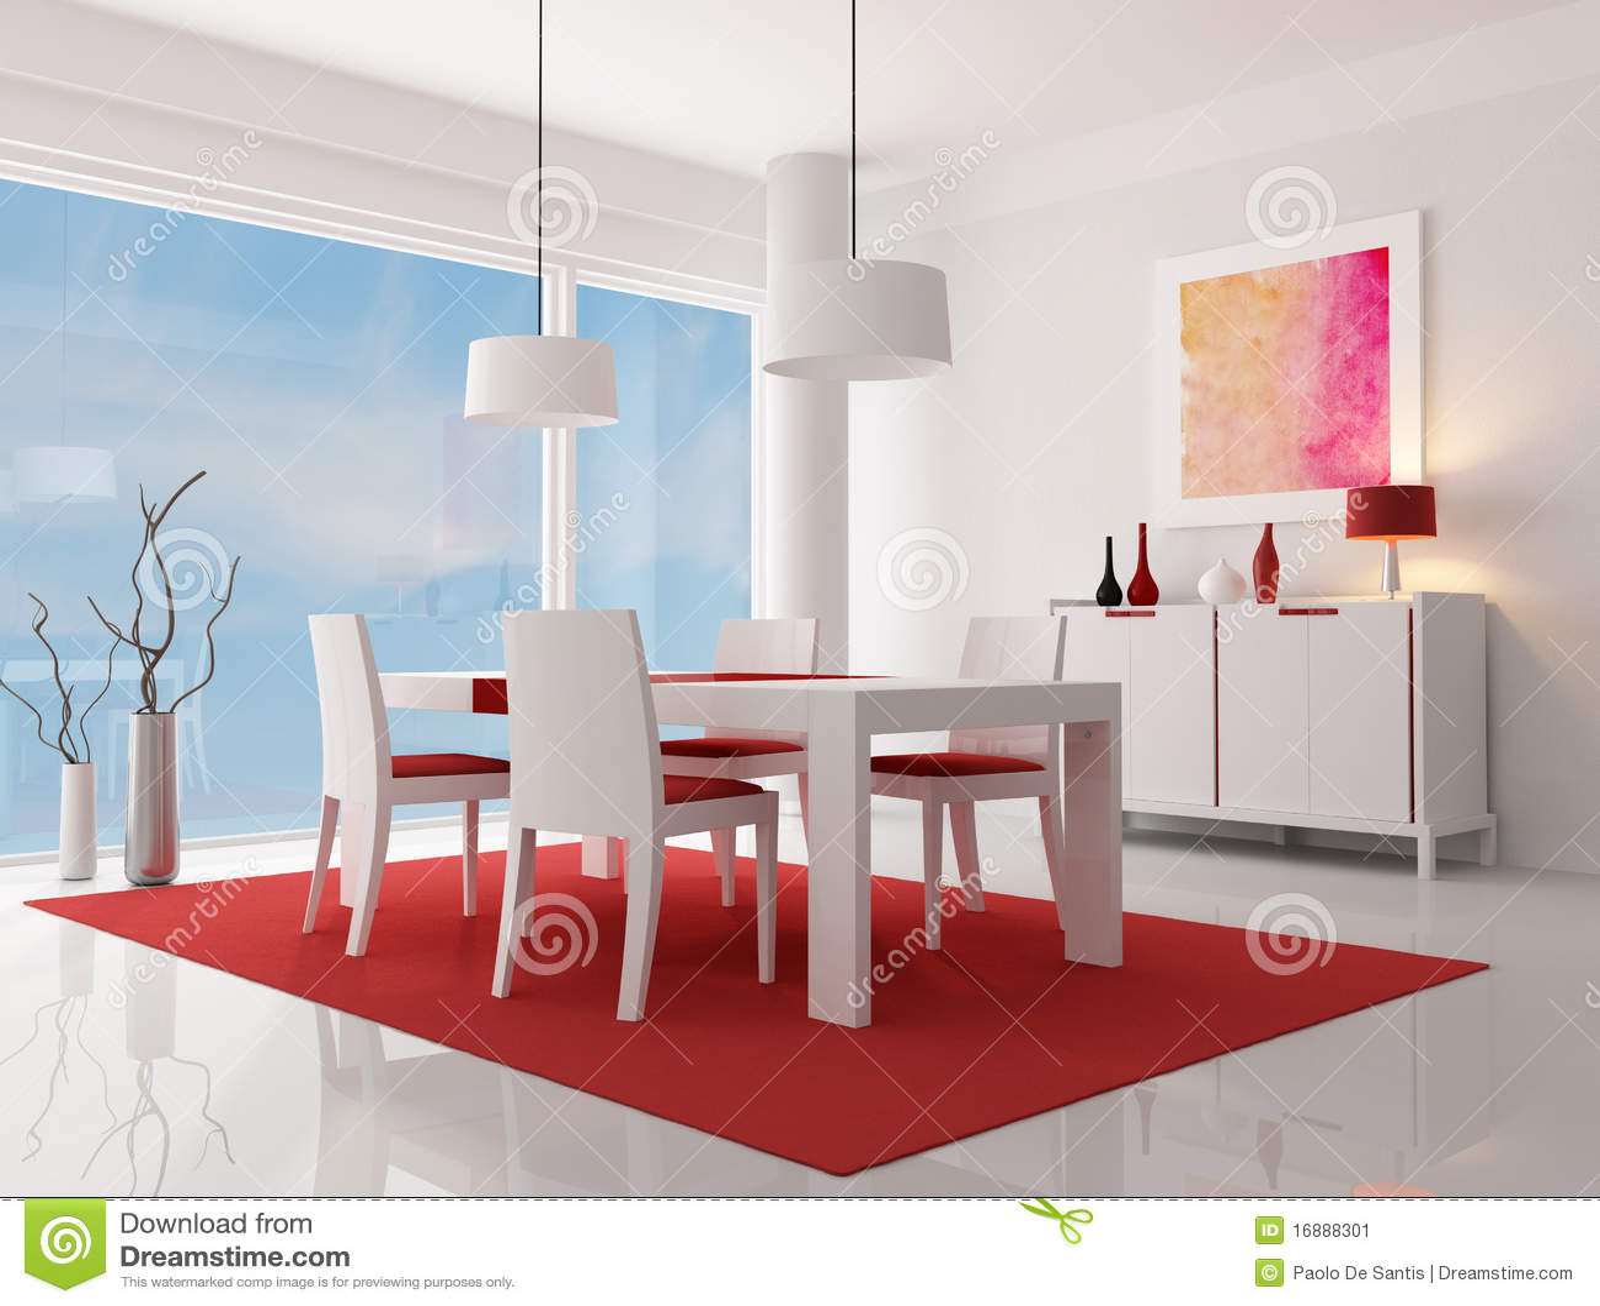 La Sala Da Pranzo Moderna Bianca E Rossa Rappresentazione L'opera  #B01B54 1300 1078 Sala Da Pranzo Arte Contemporanea